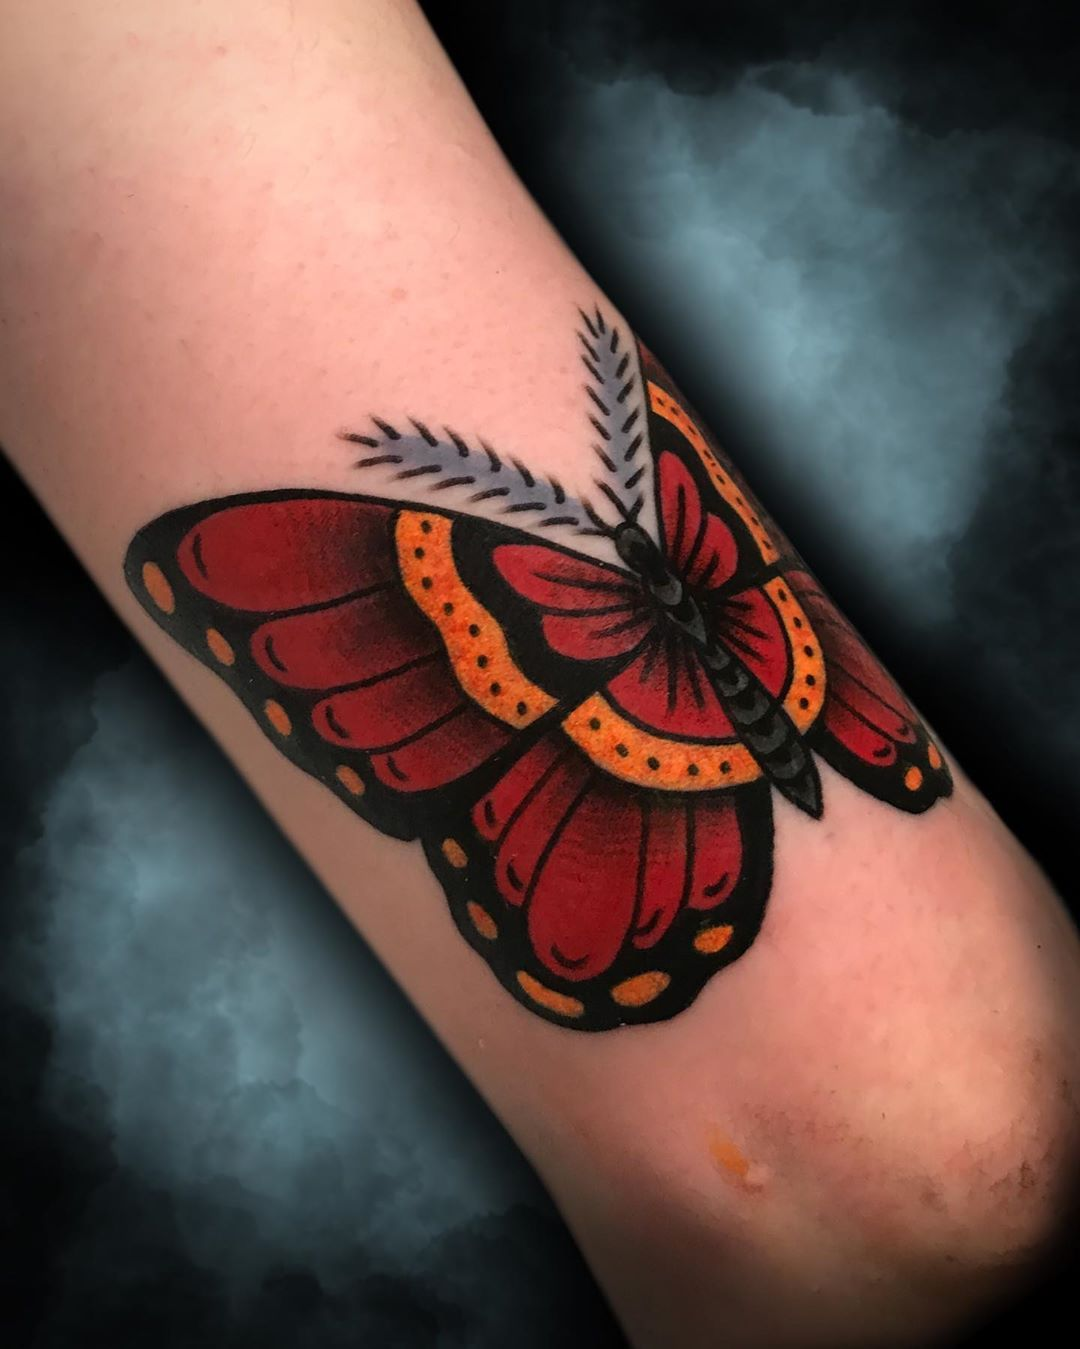 Red Black Butterfly Tattoo in 2020 Black butterfly